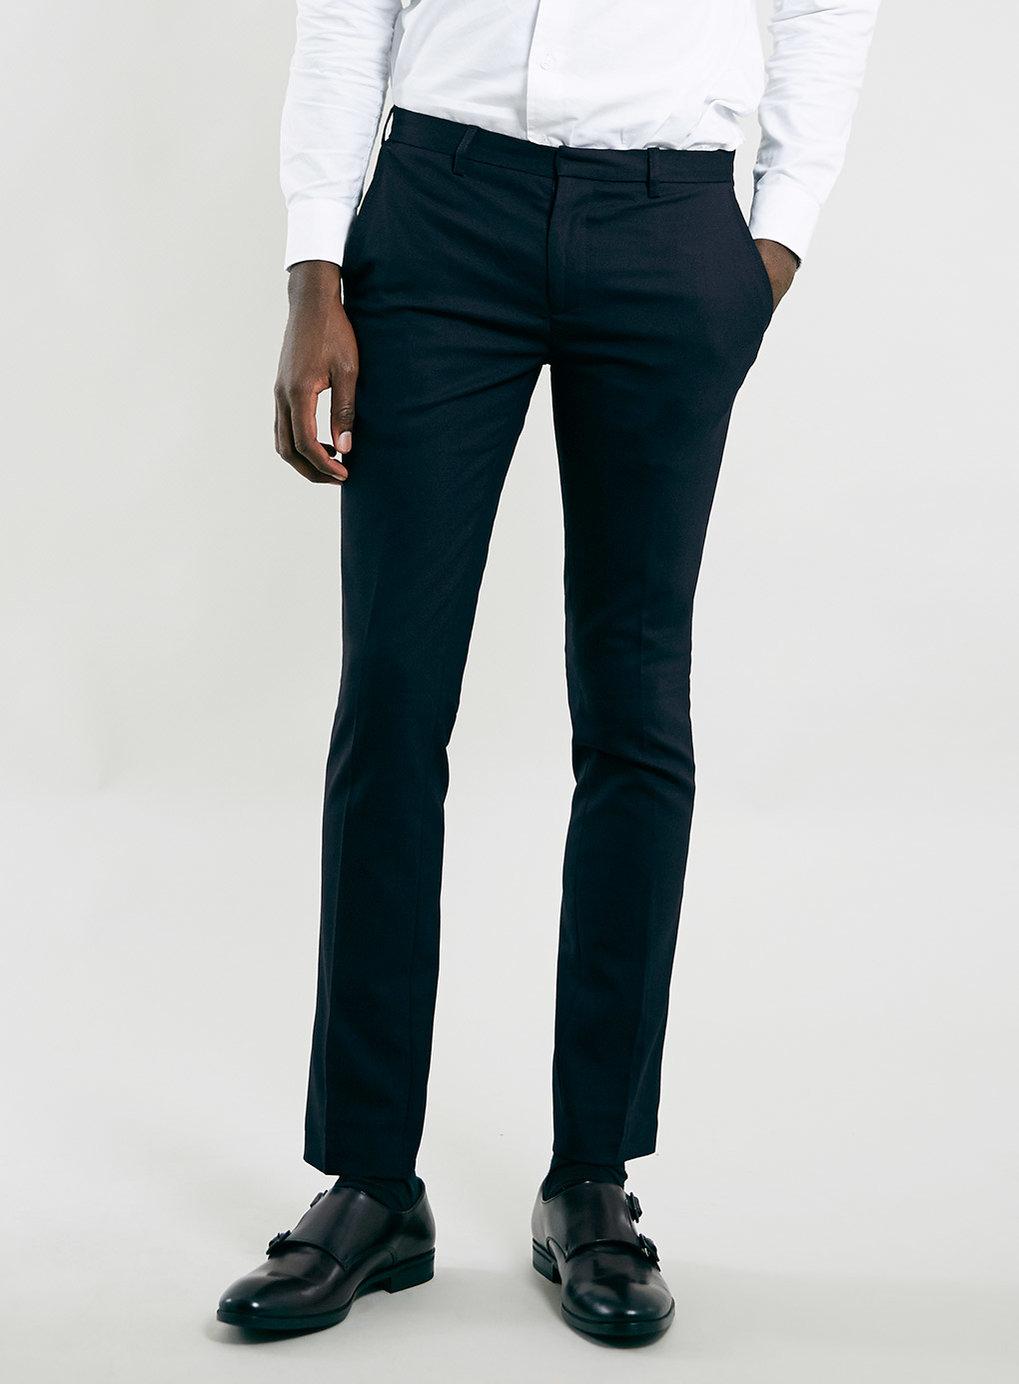 Lastest Calvin Klein Curvy Straight-Leg Pants | Dillardu0026#39;s